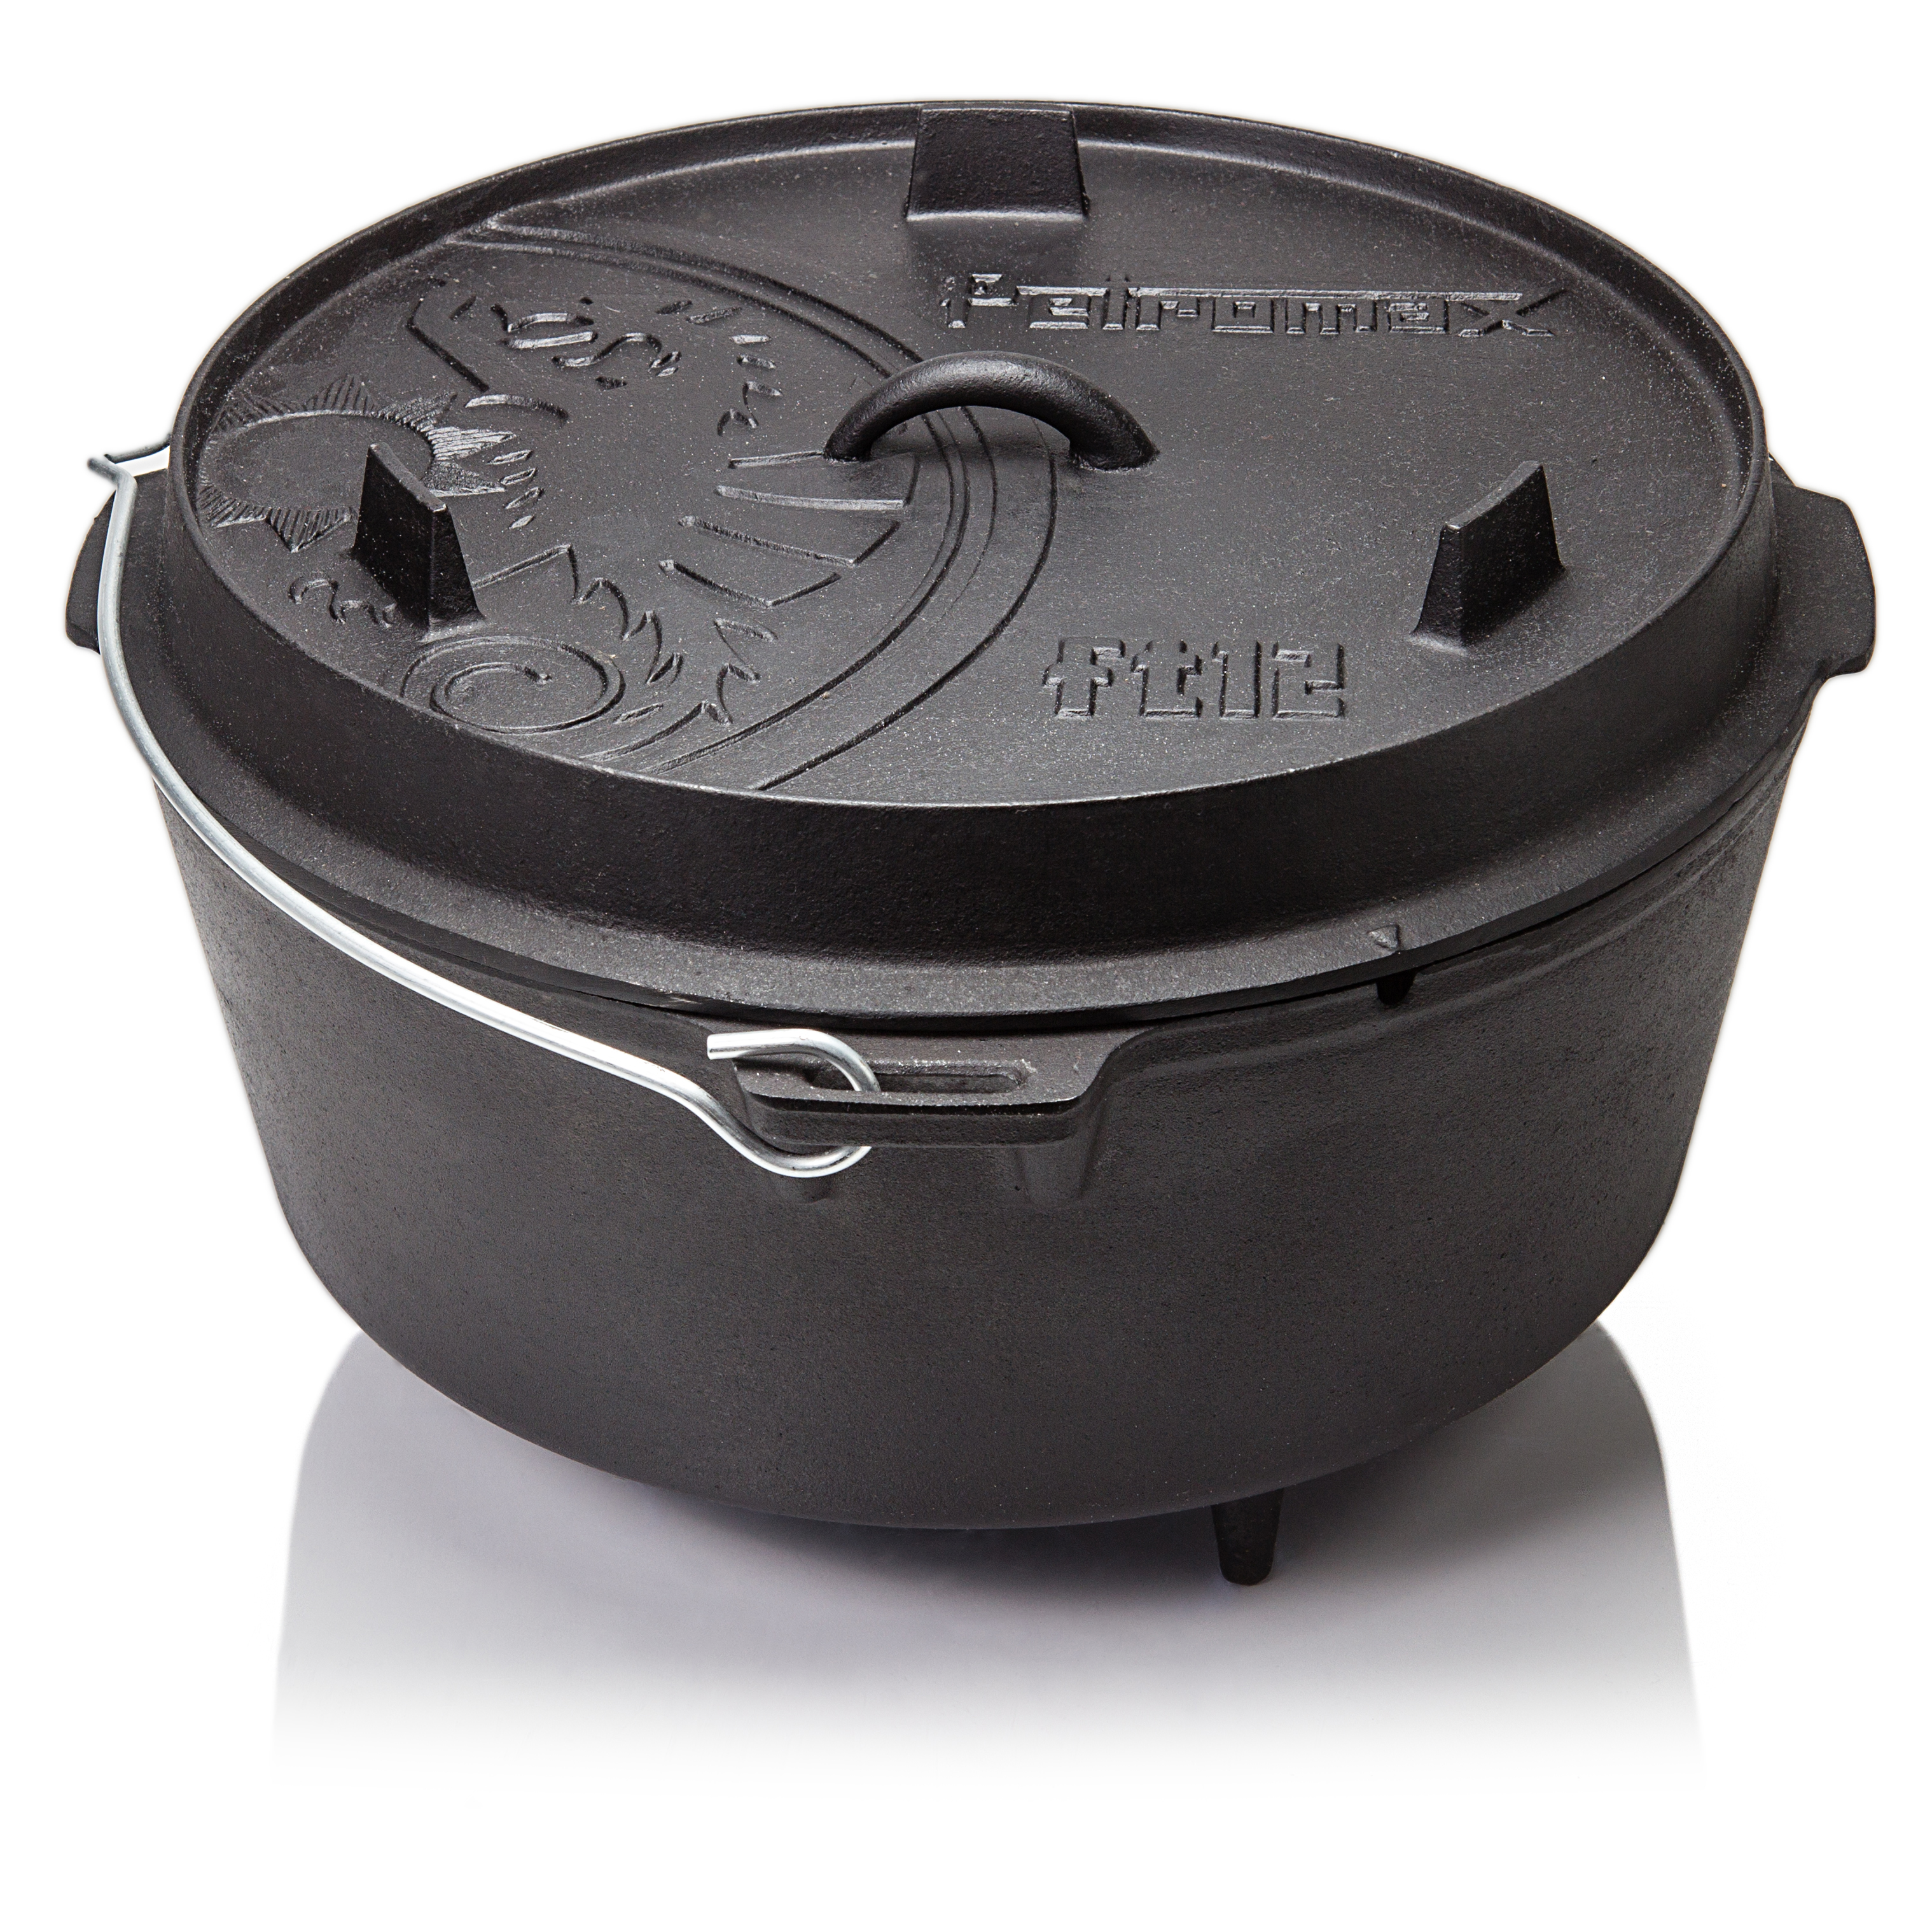 Petromax Kastenform k4 Dutch Oven Gusseisen Feuertopf Brotbackform Kuchen Braten